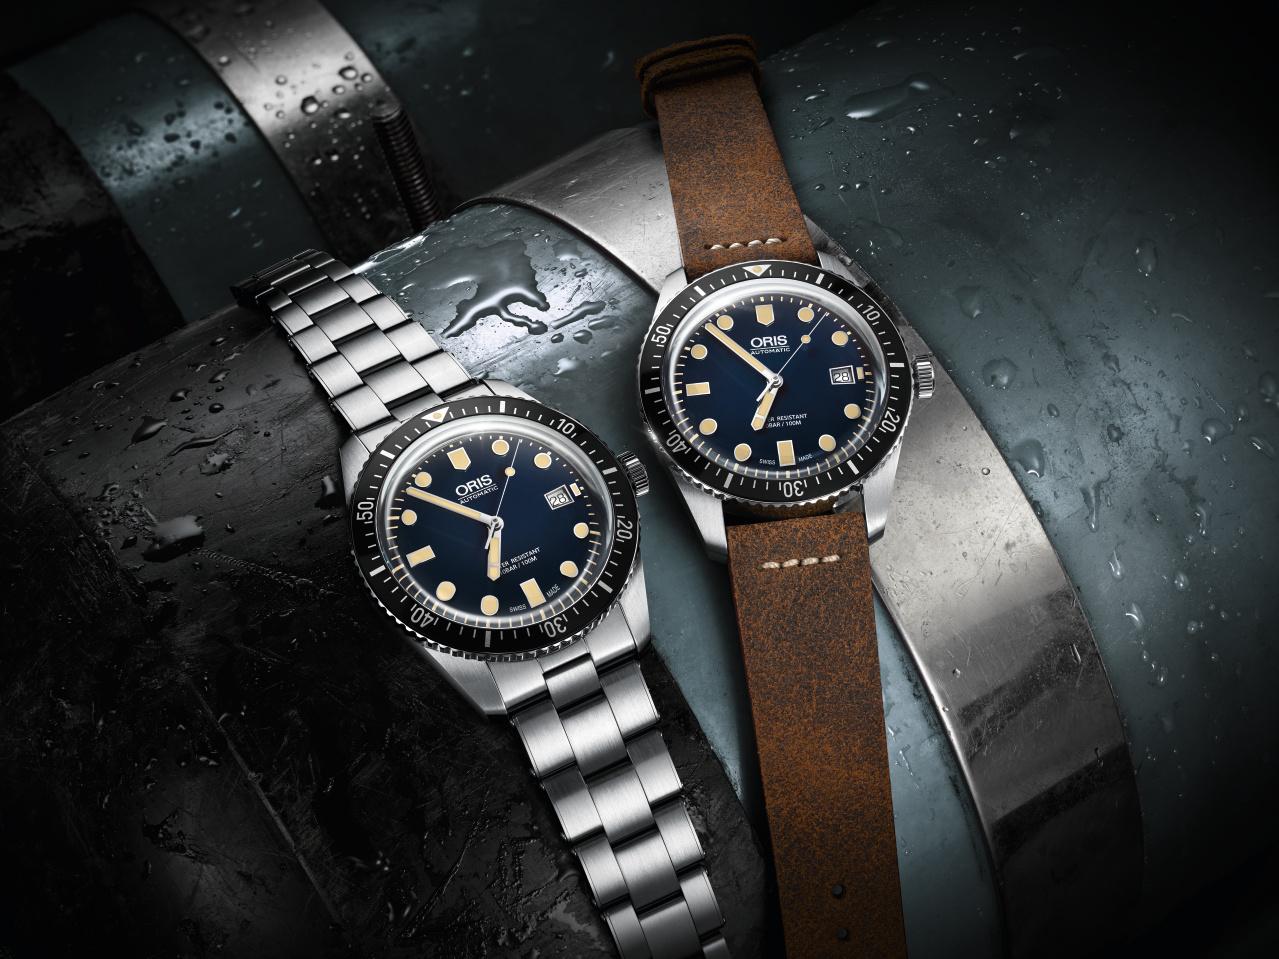 01 733 7720 4055-07 5 21 02 - Oris Divers Sixty-Five